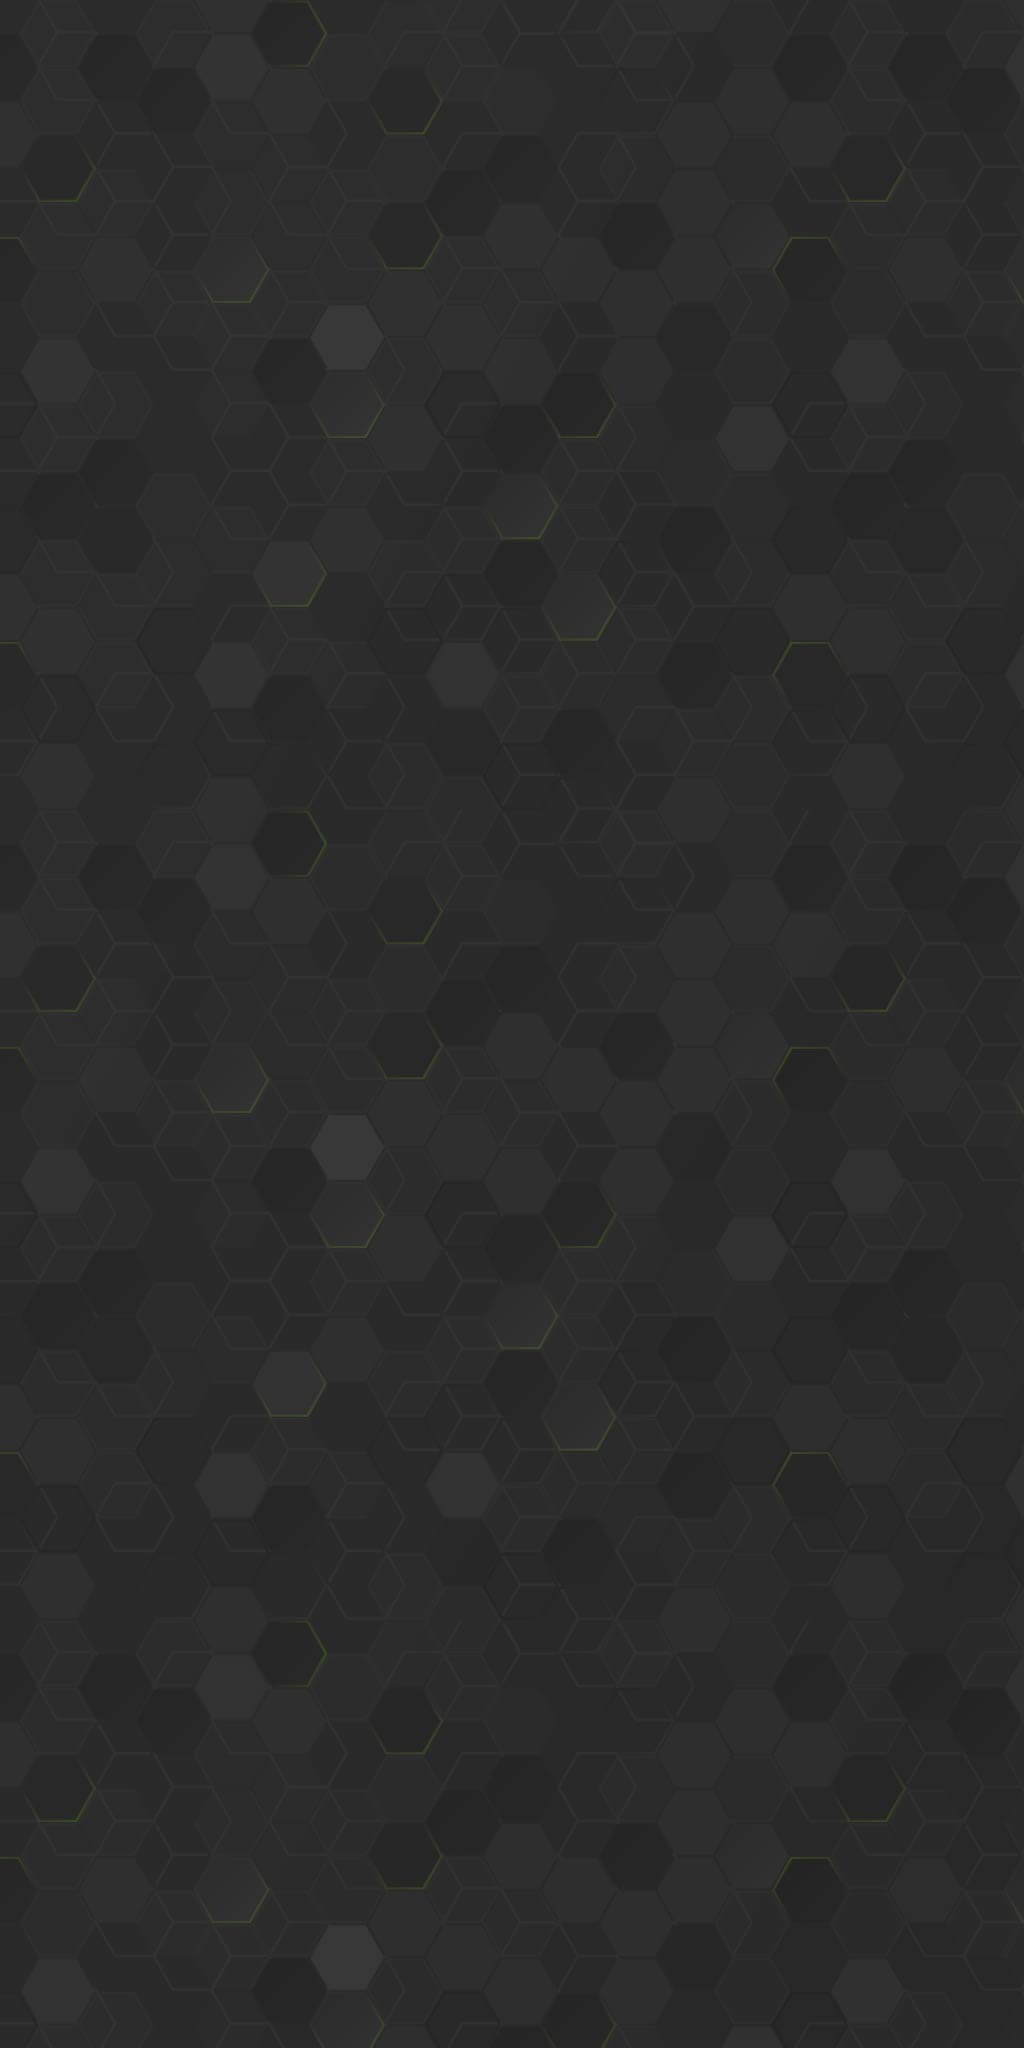 A dark-grey hexagon-patterned background.